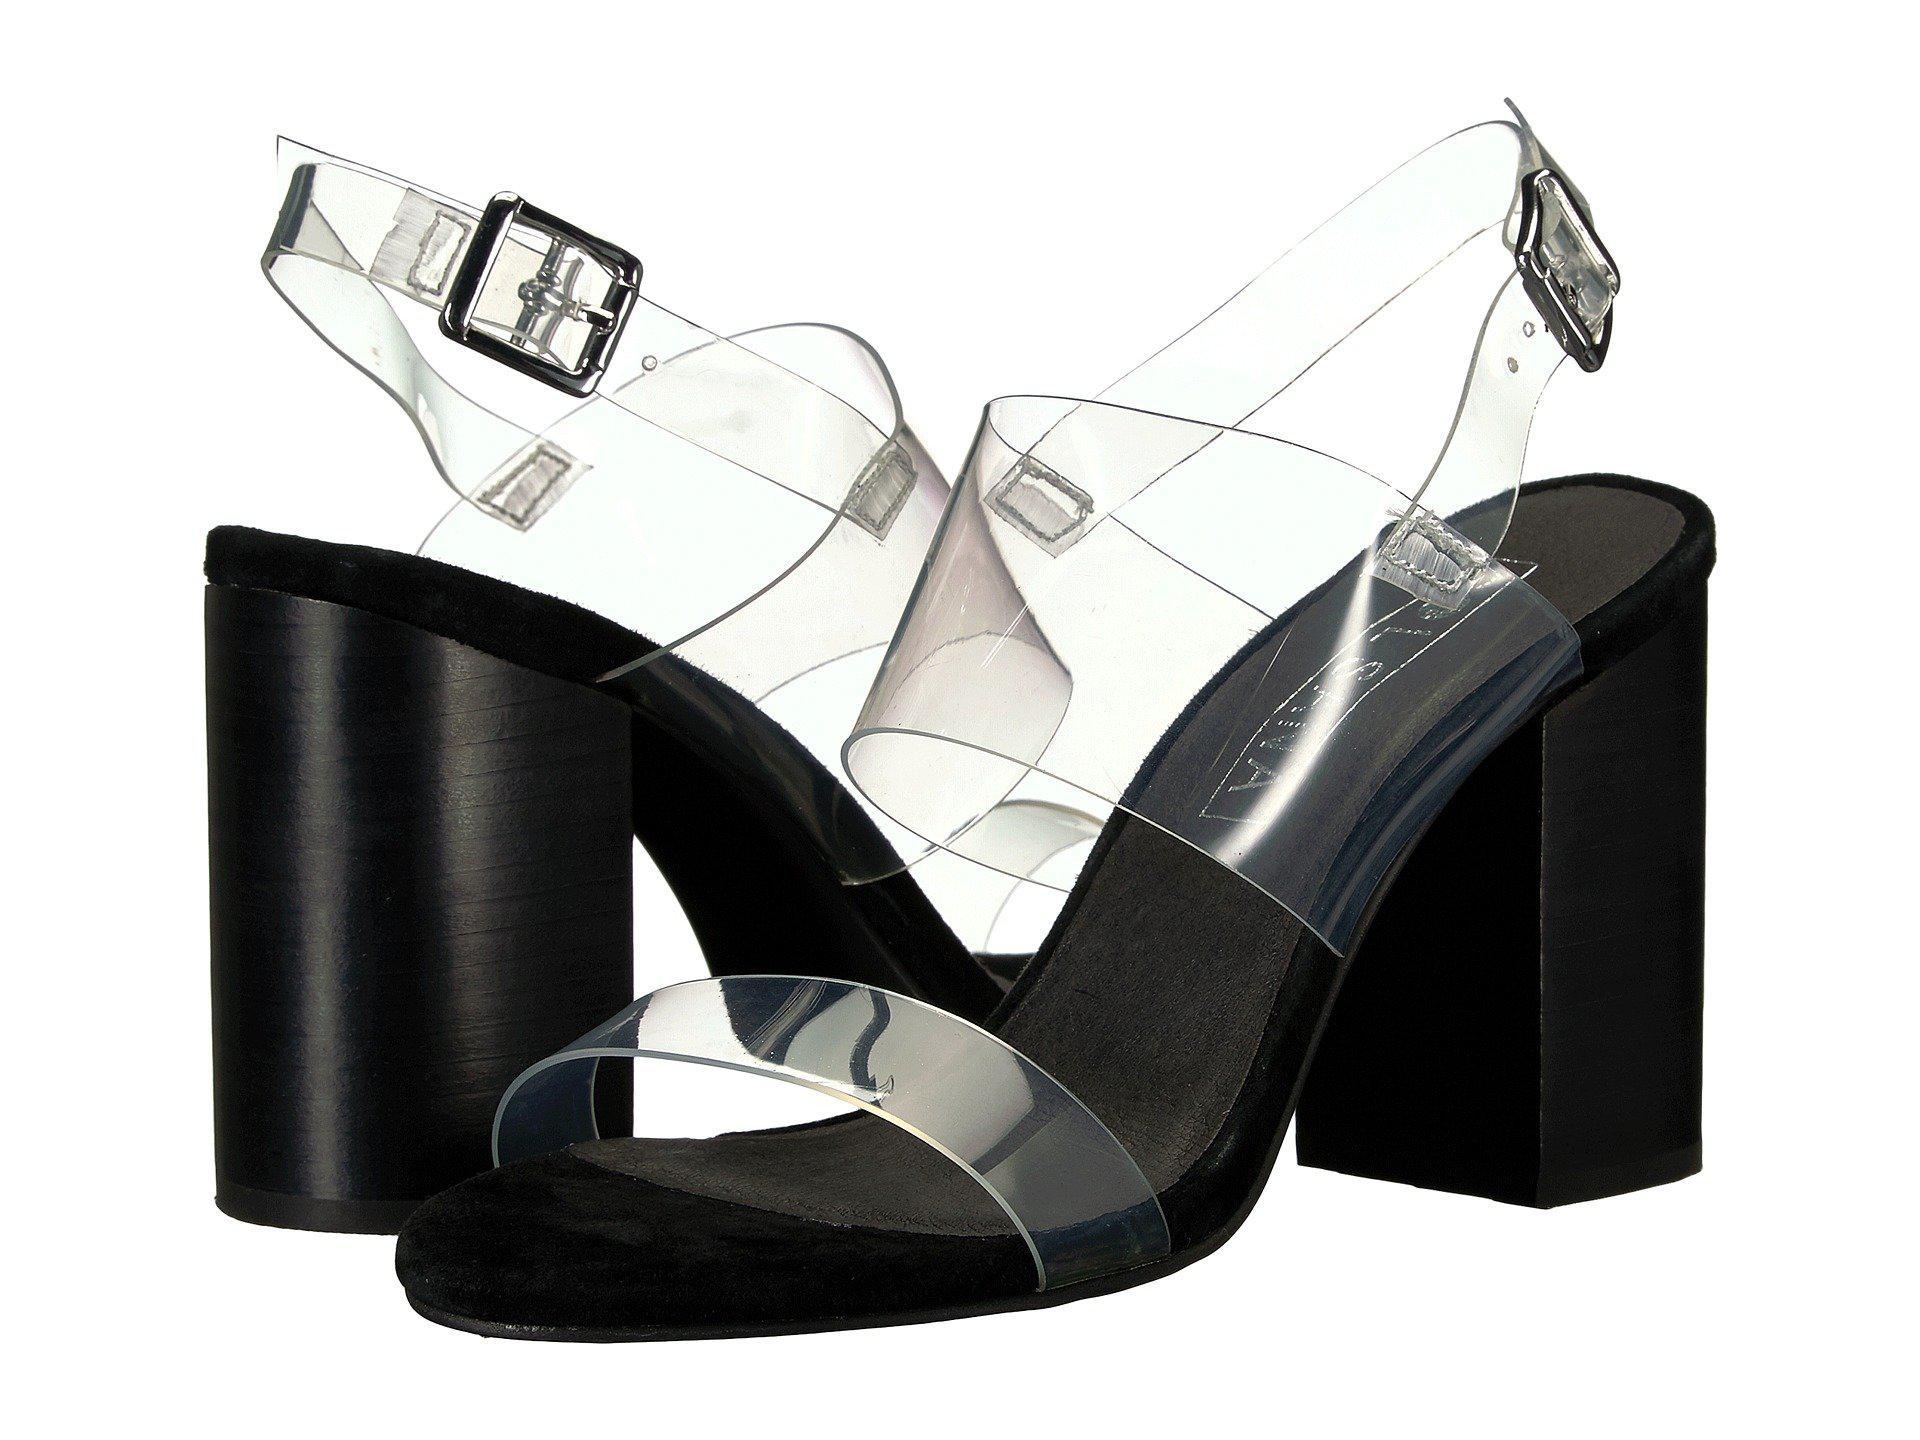 Sol Sana Tucker Black Strap Block Heeled Shoes Low Price Great Deals Pick A Best Online k4HSLrvT